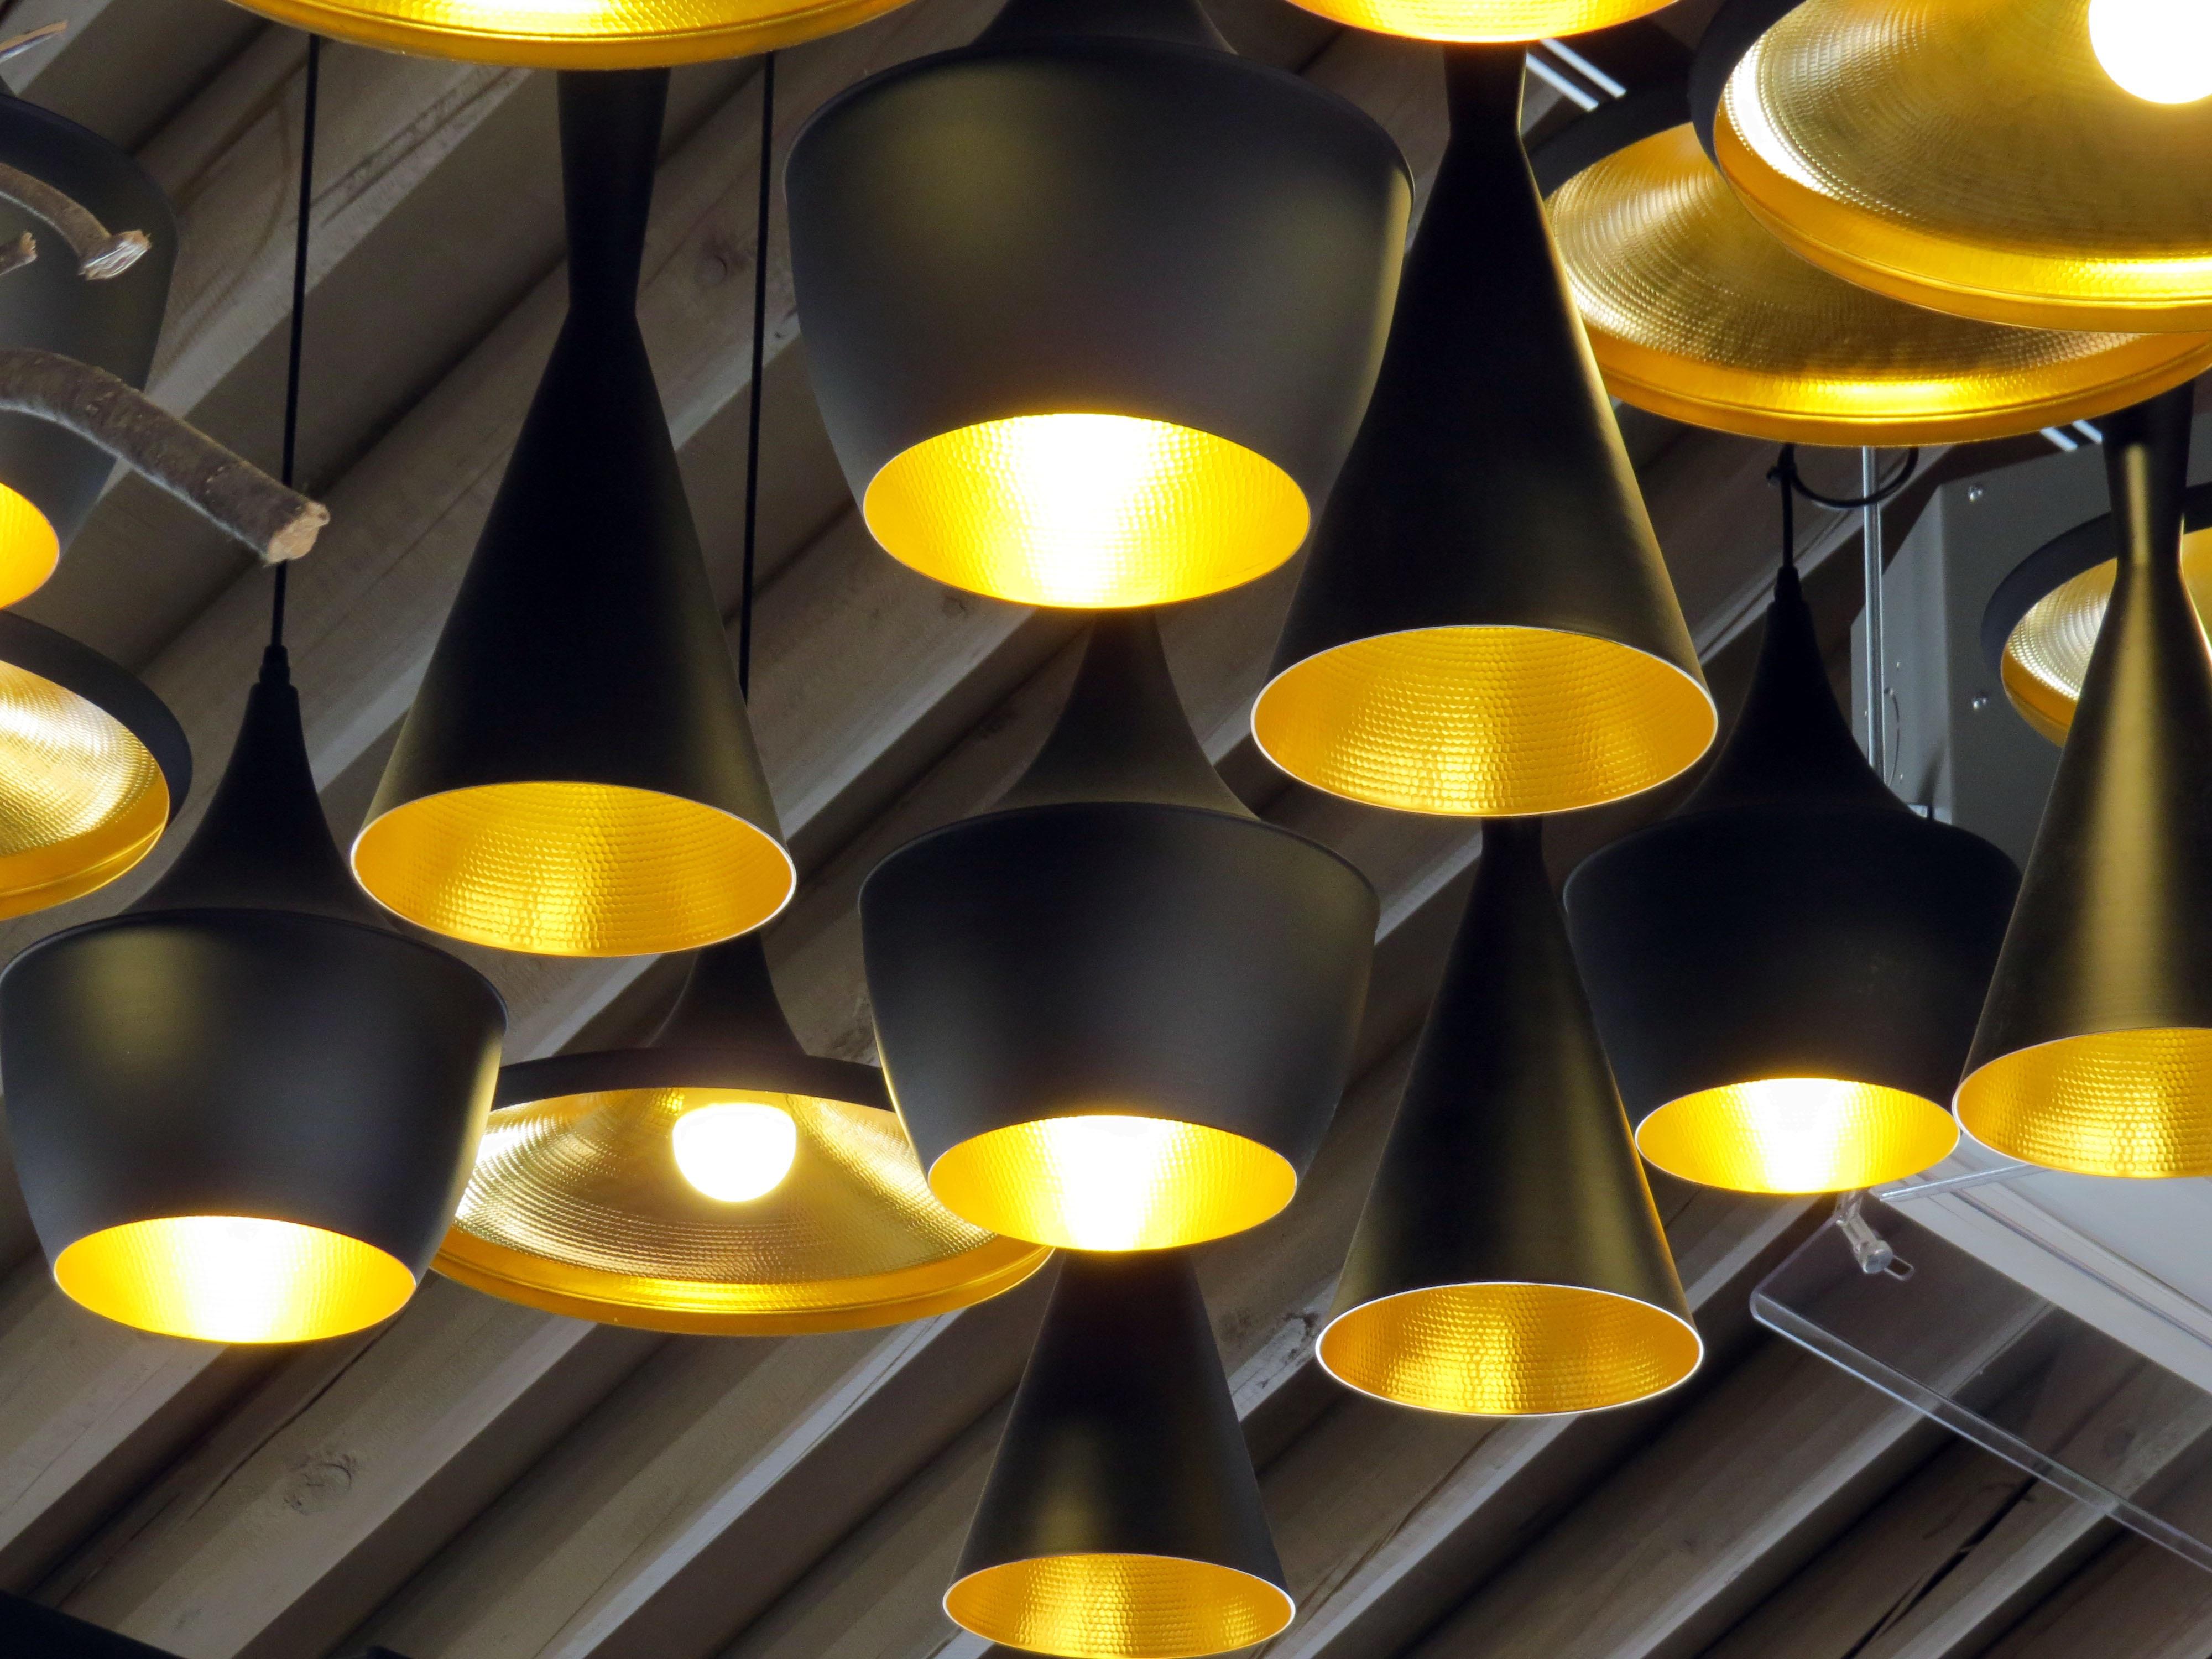 ligero techo amarillo iluminacin luces lmpara techos etc artefactos de iluminacin